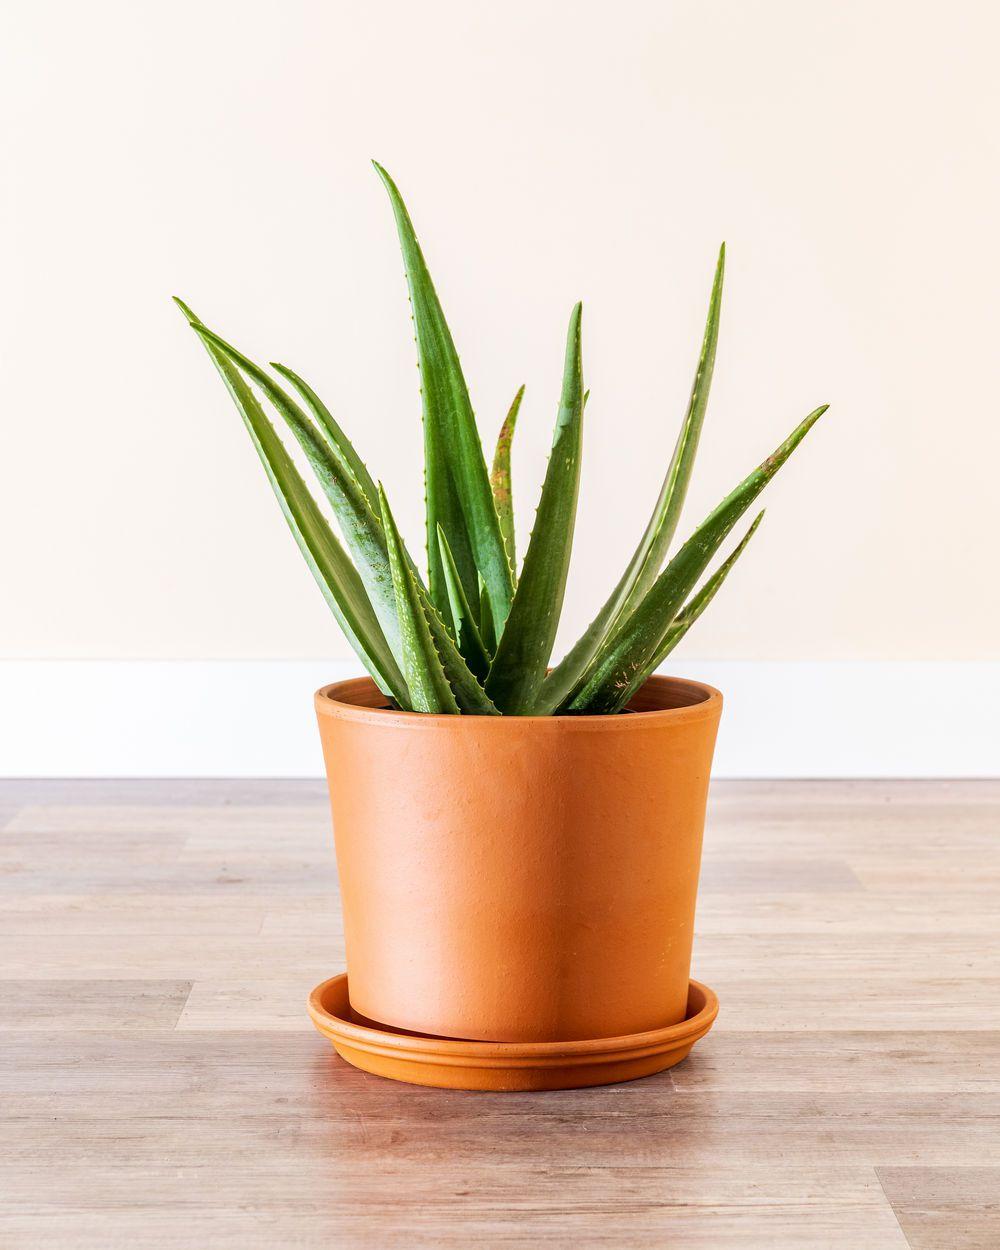 Aloe vera in a terra cotta pot on a wood floor